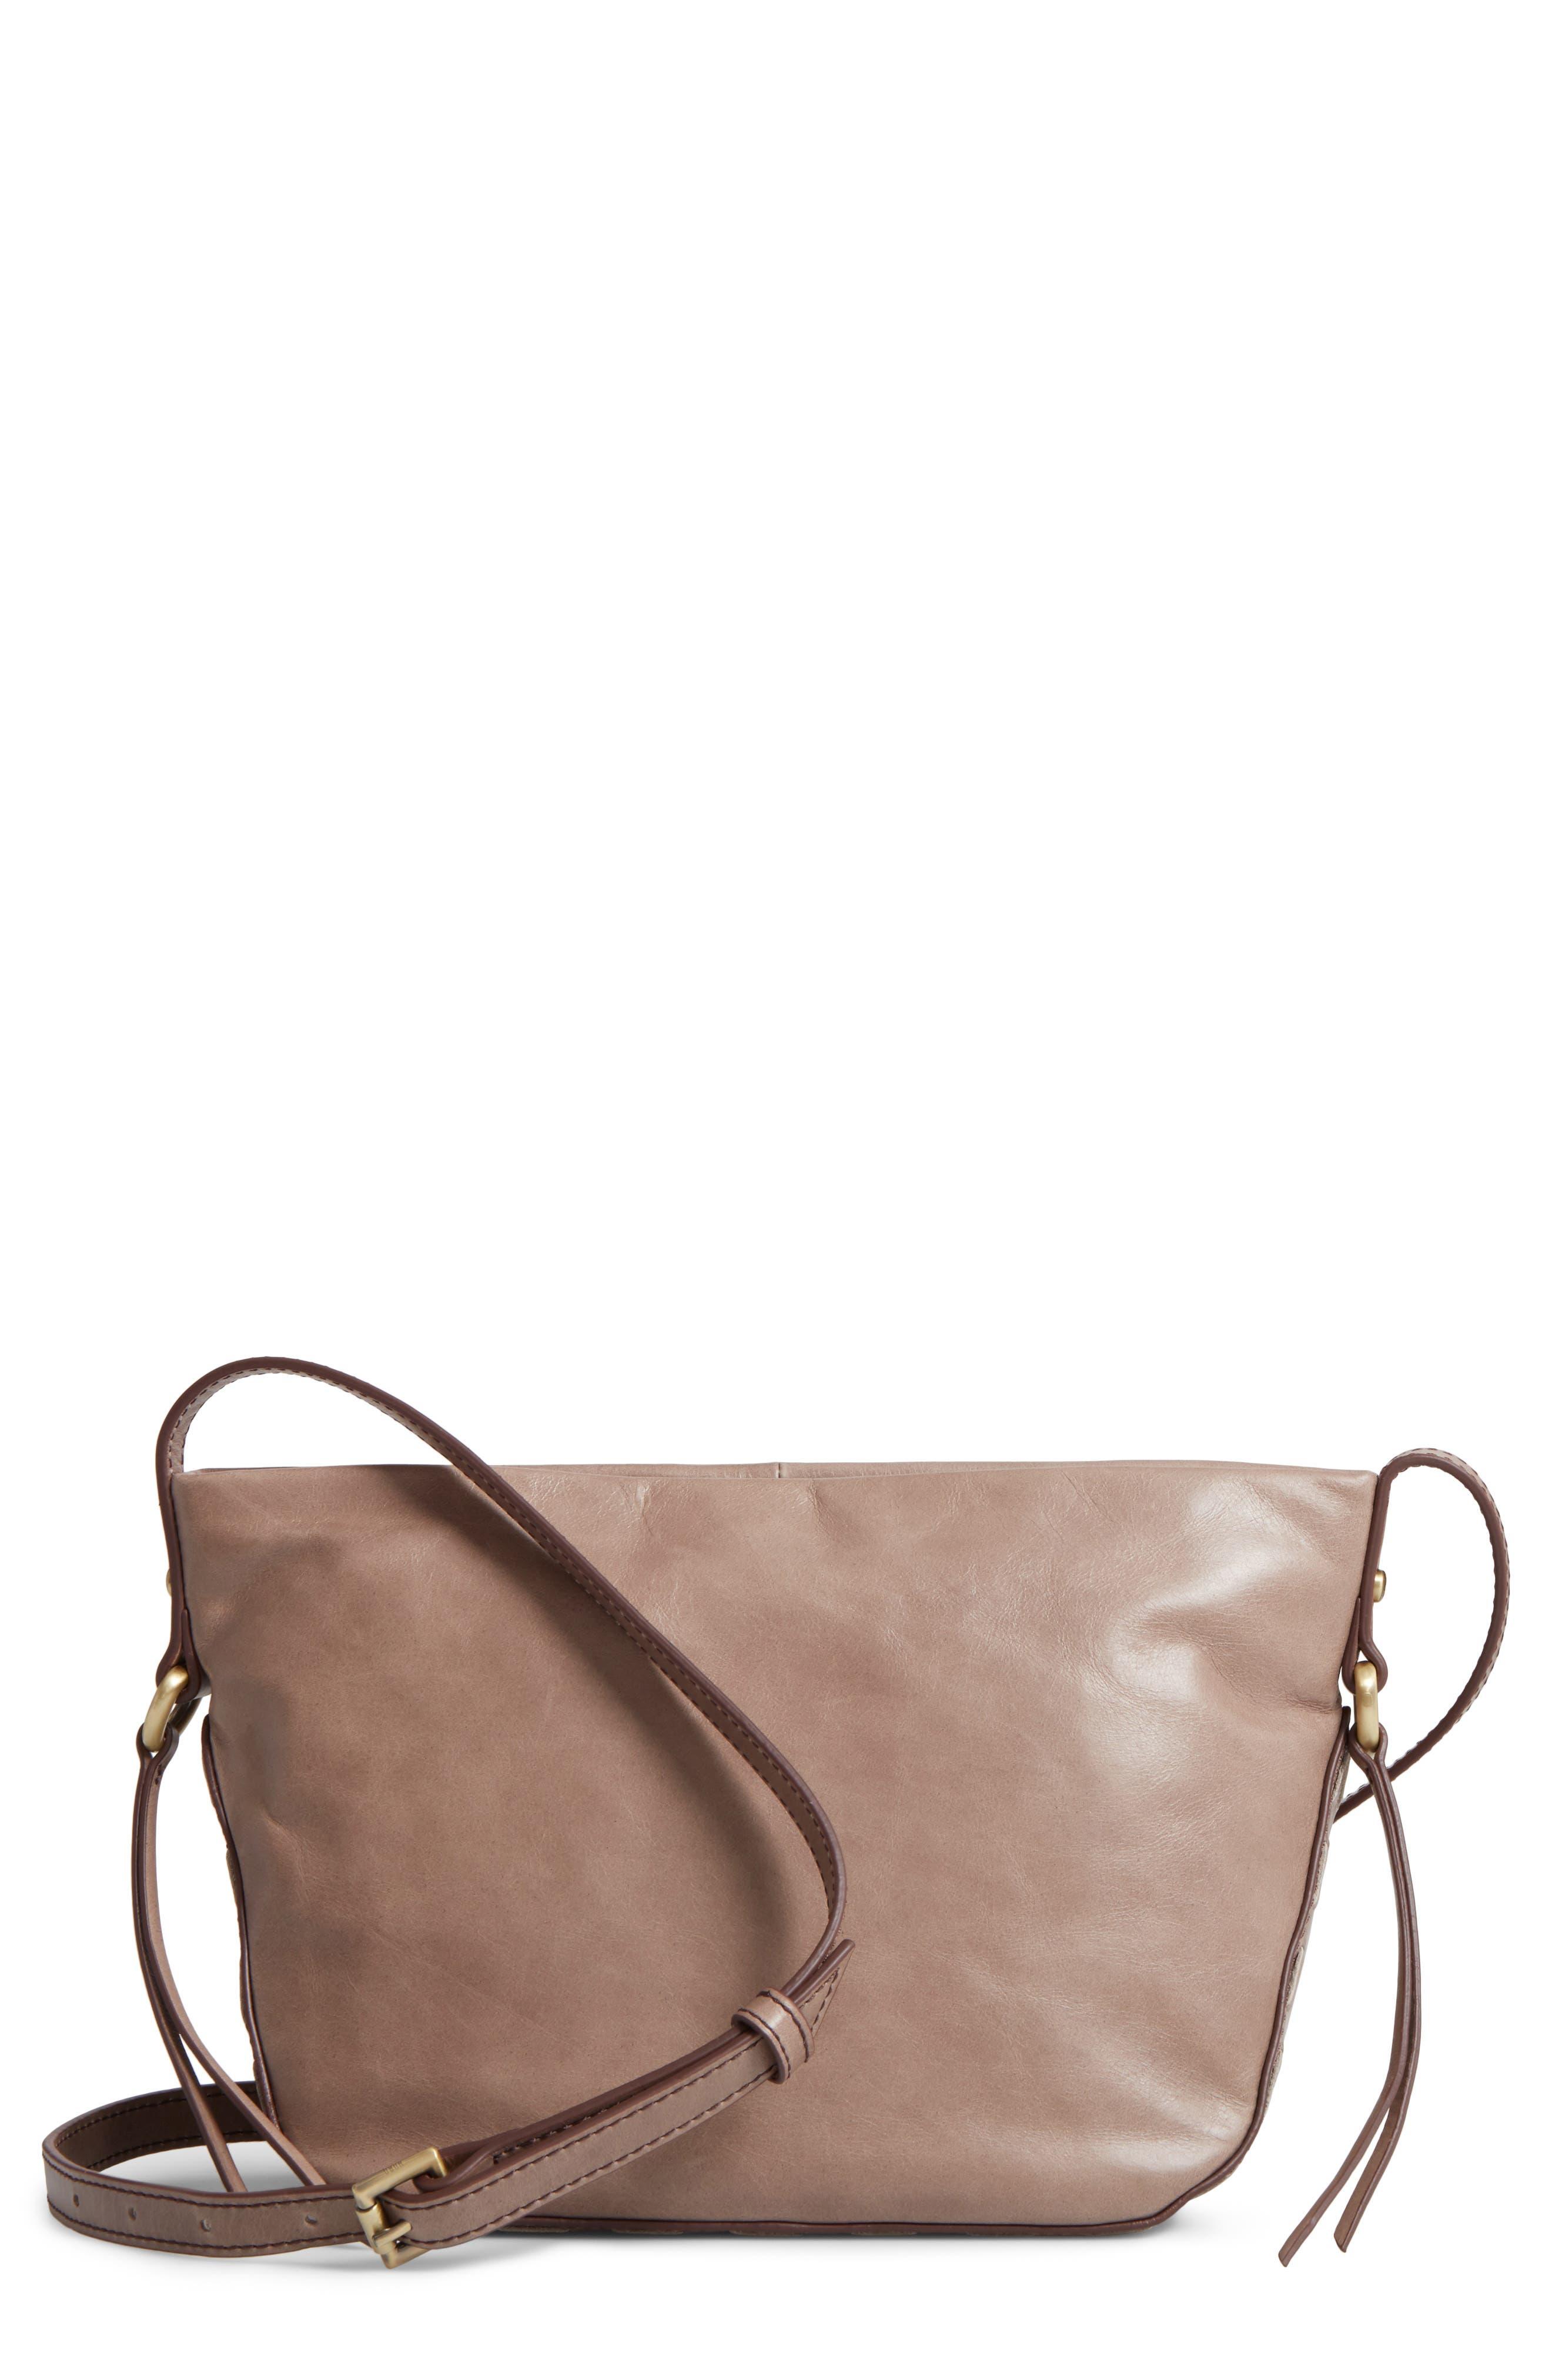 Hobo Muse Calfskin Leather Crossbody Bag